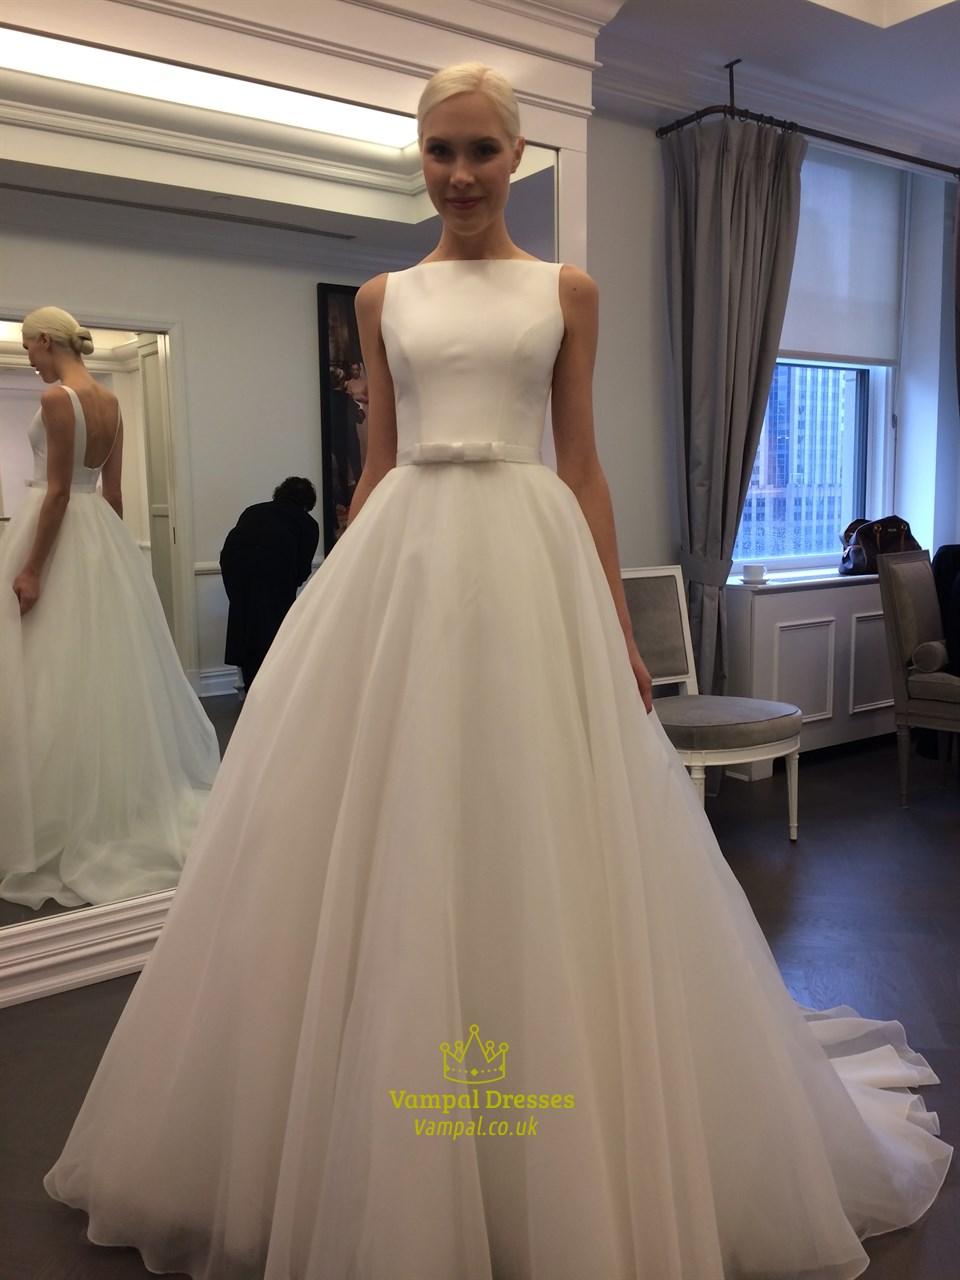 Elegant White Chiffon Floor Length Strapless Wedding Dress